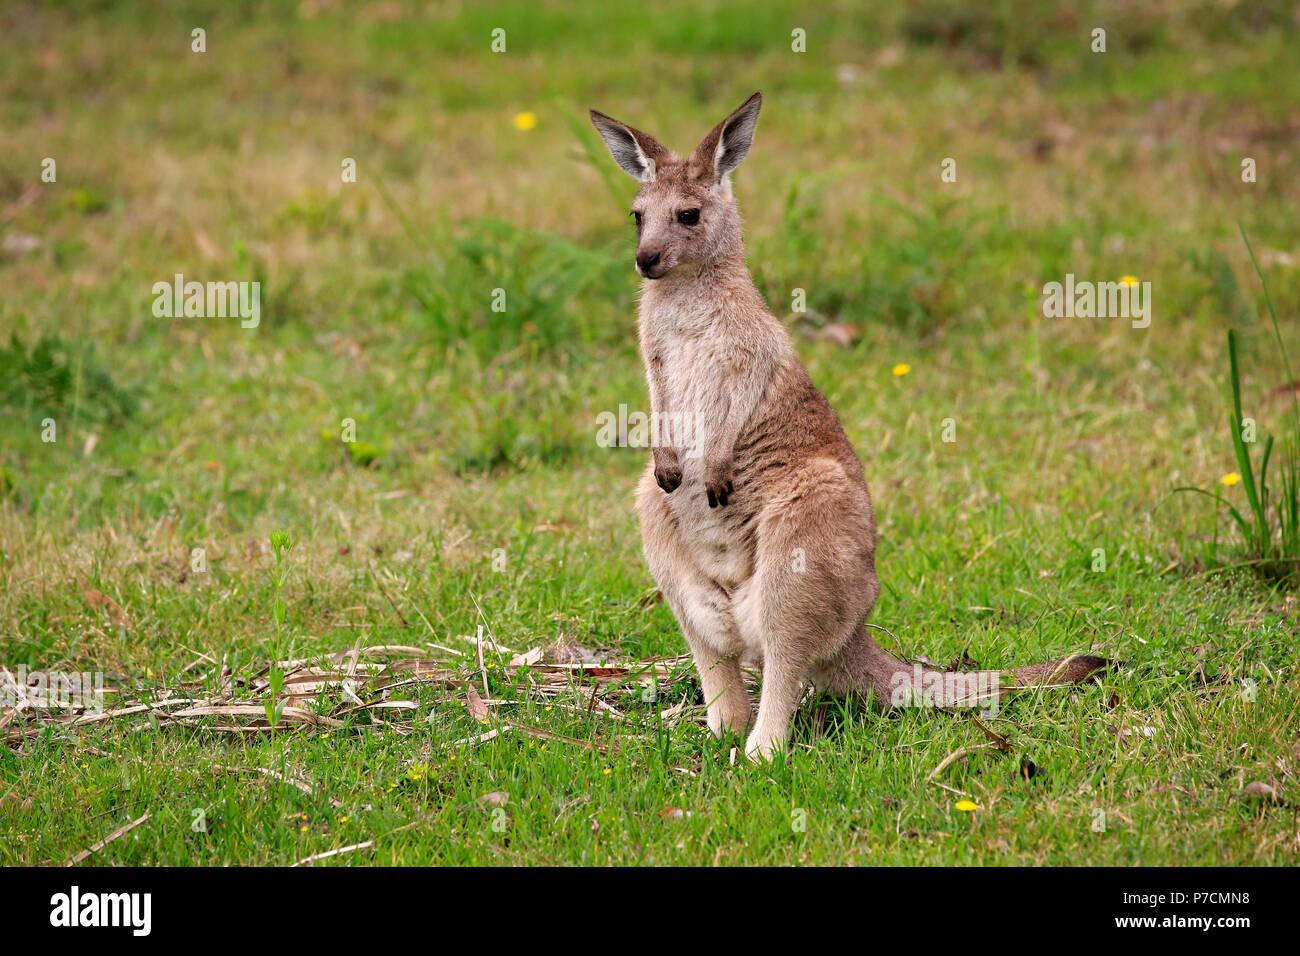 Canguro gris oriental, subadulto, Feliz Playa, Parque Nacional Murramarang, New South Wales, Australia (Macropus giganteus) Imagen De Stock